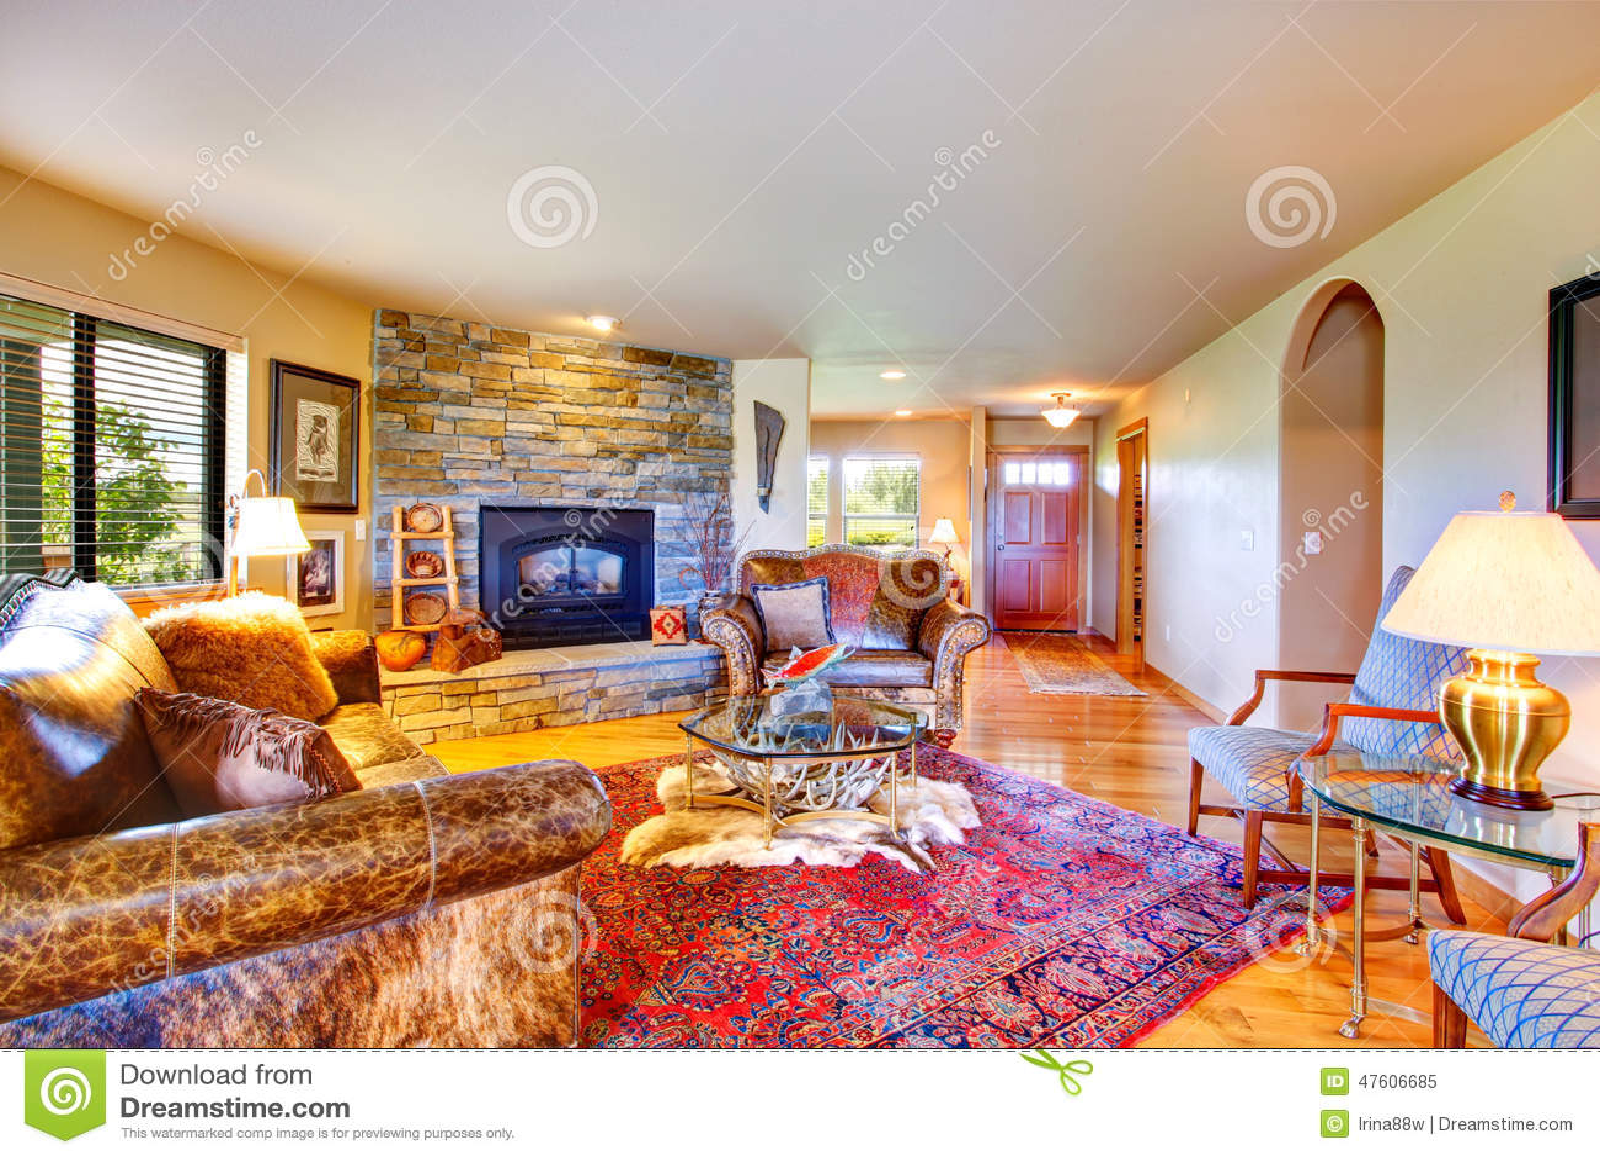 Arredamento Di Una Casa Di Campagna : Idee arredamento casa montagna atmosfera da chalet in una casa